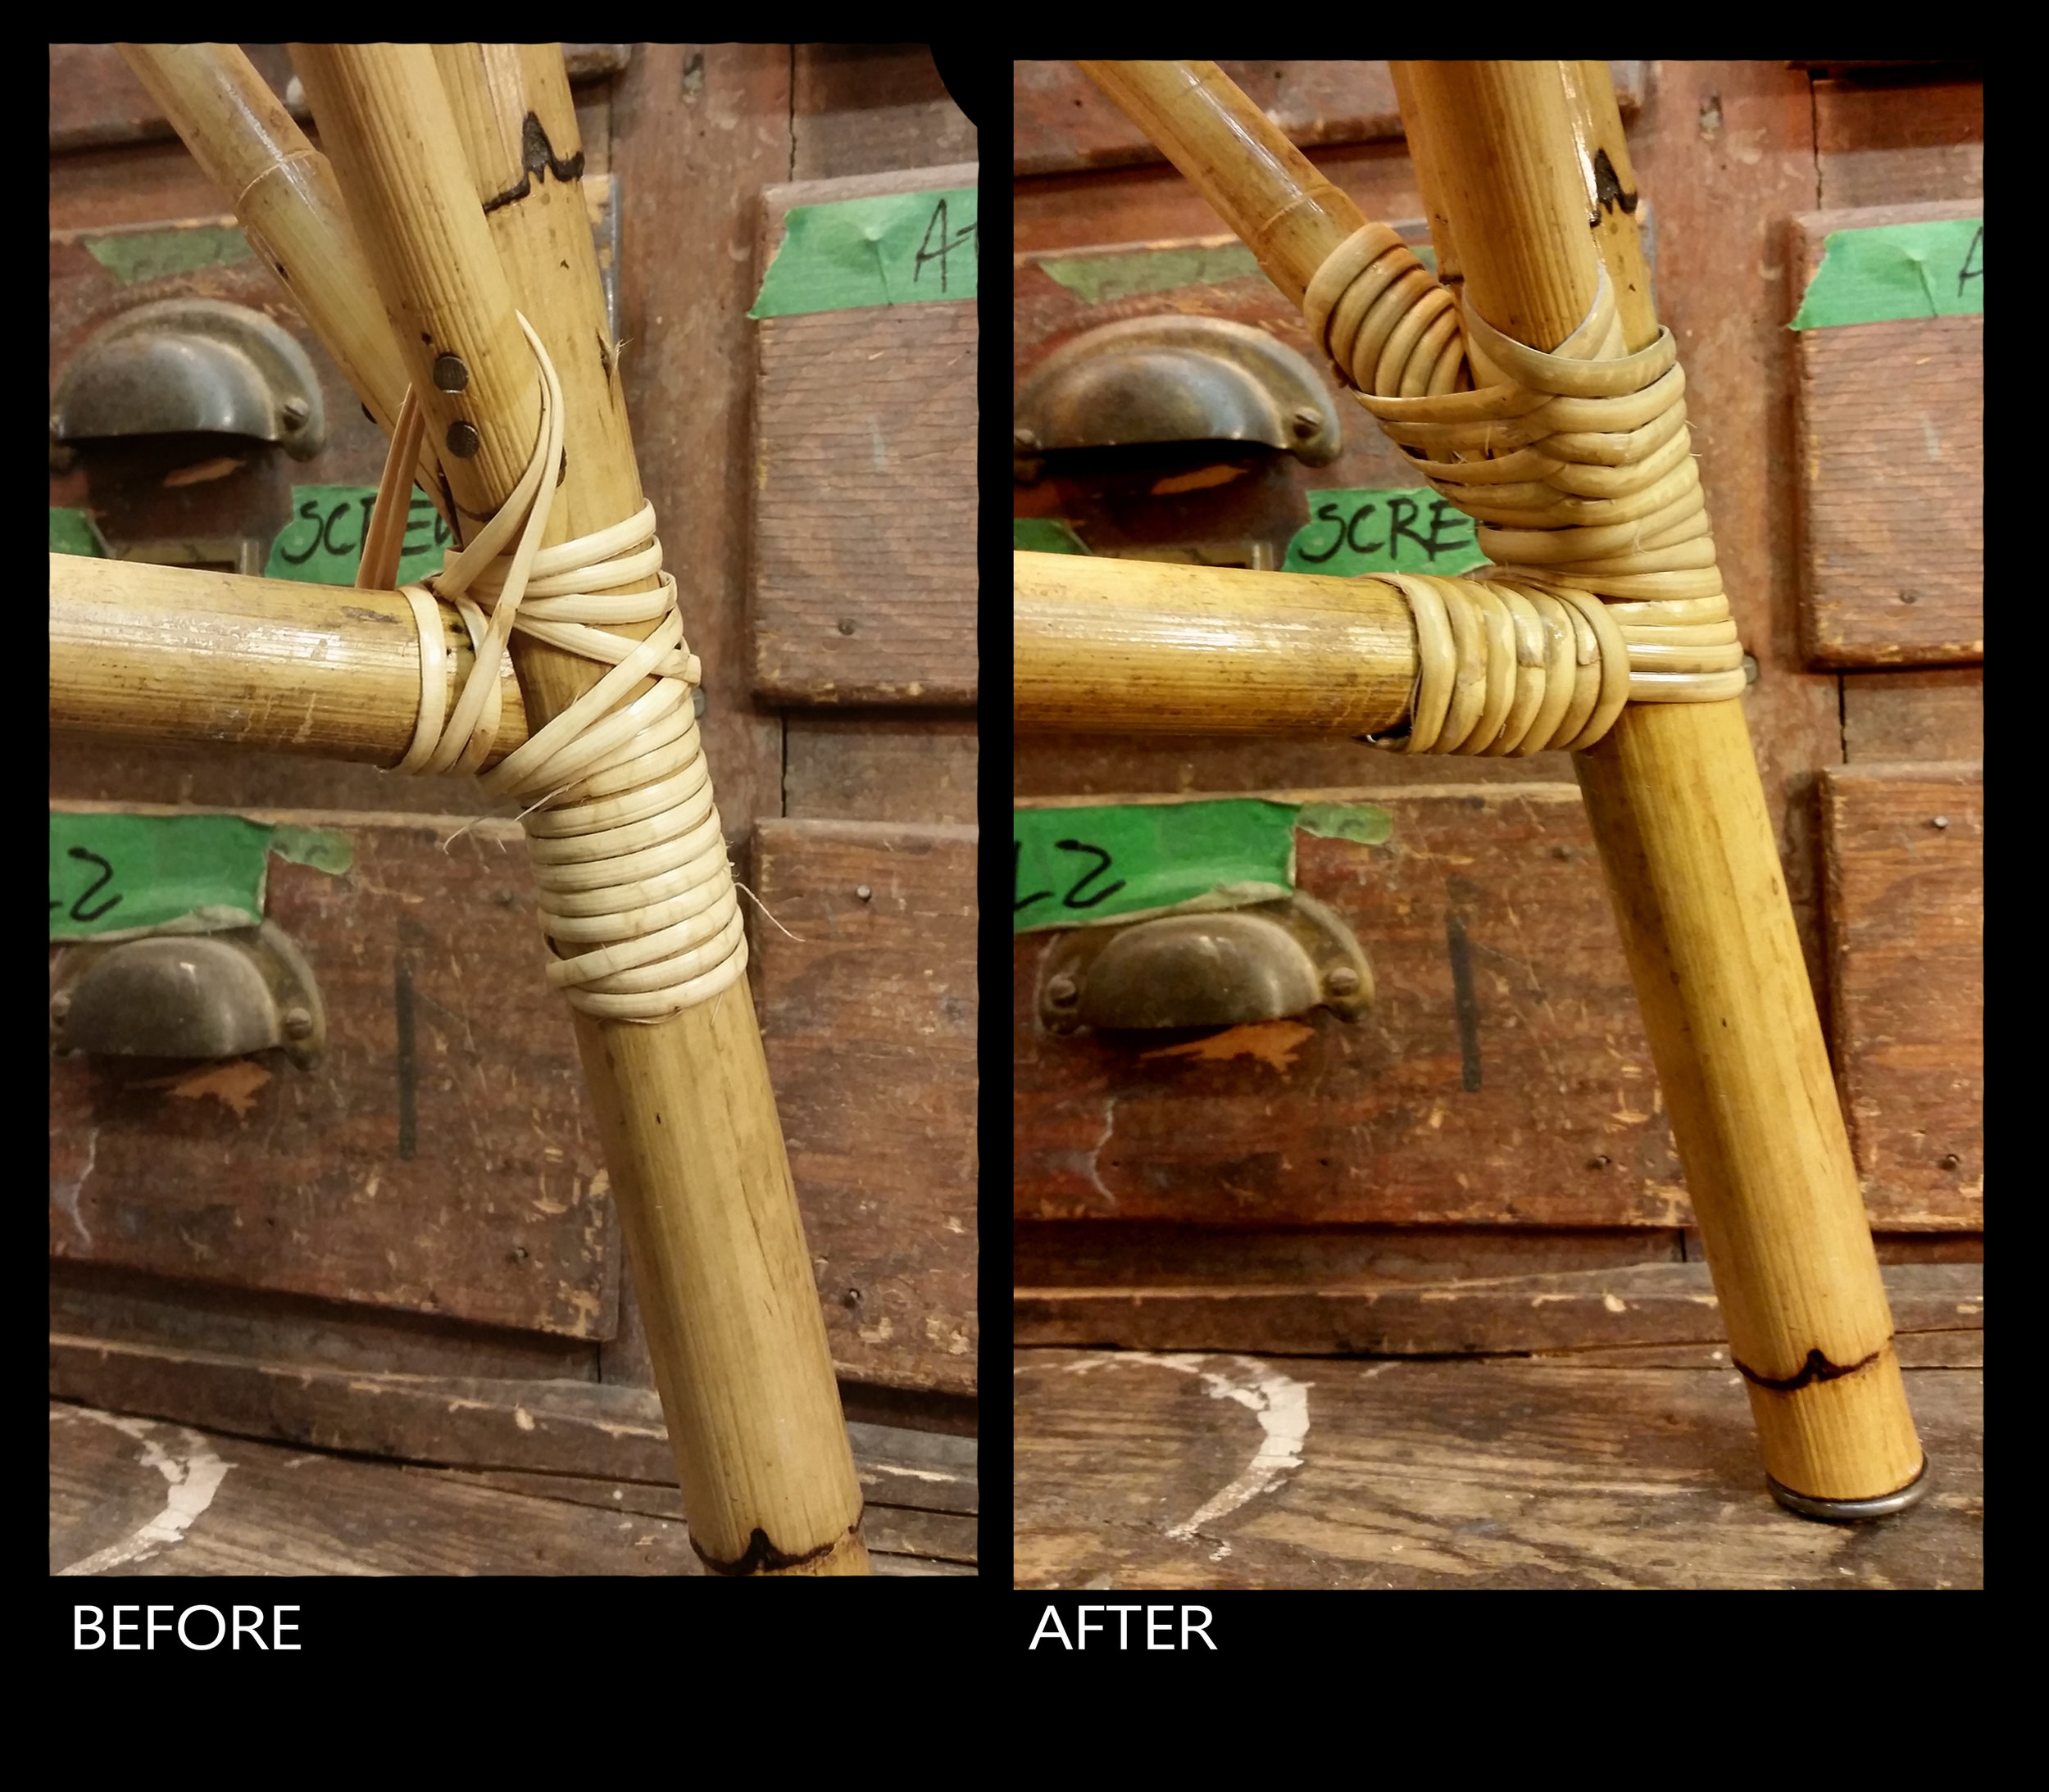 Woven binding cane on bamboo